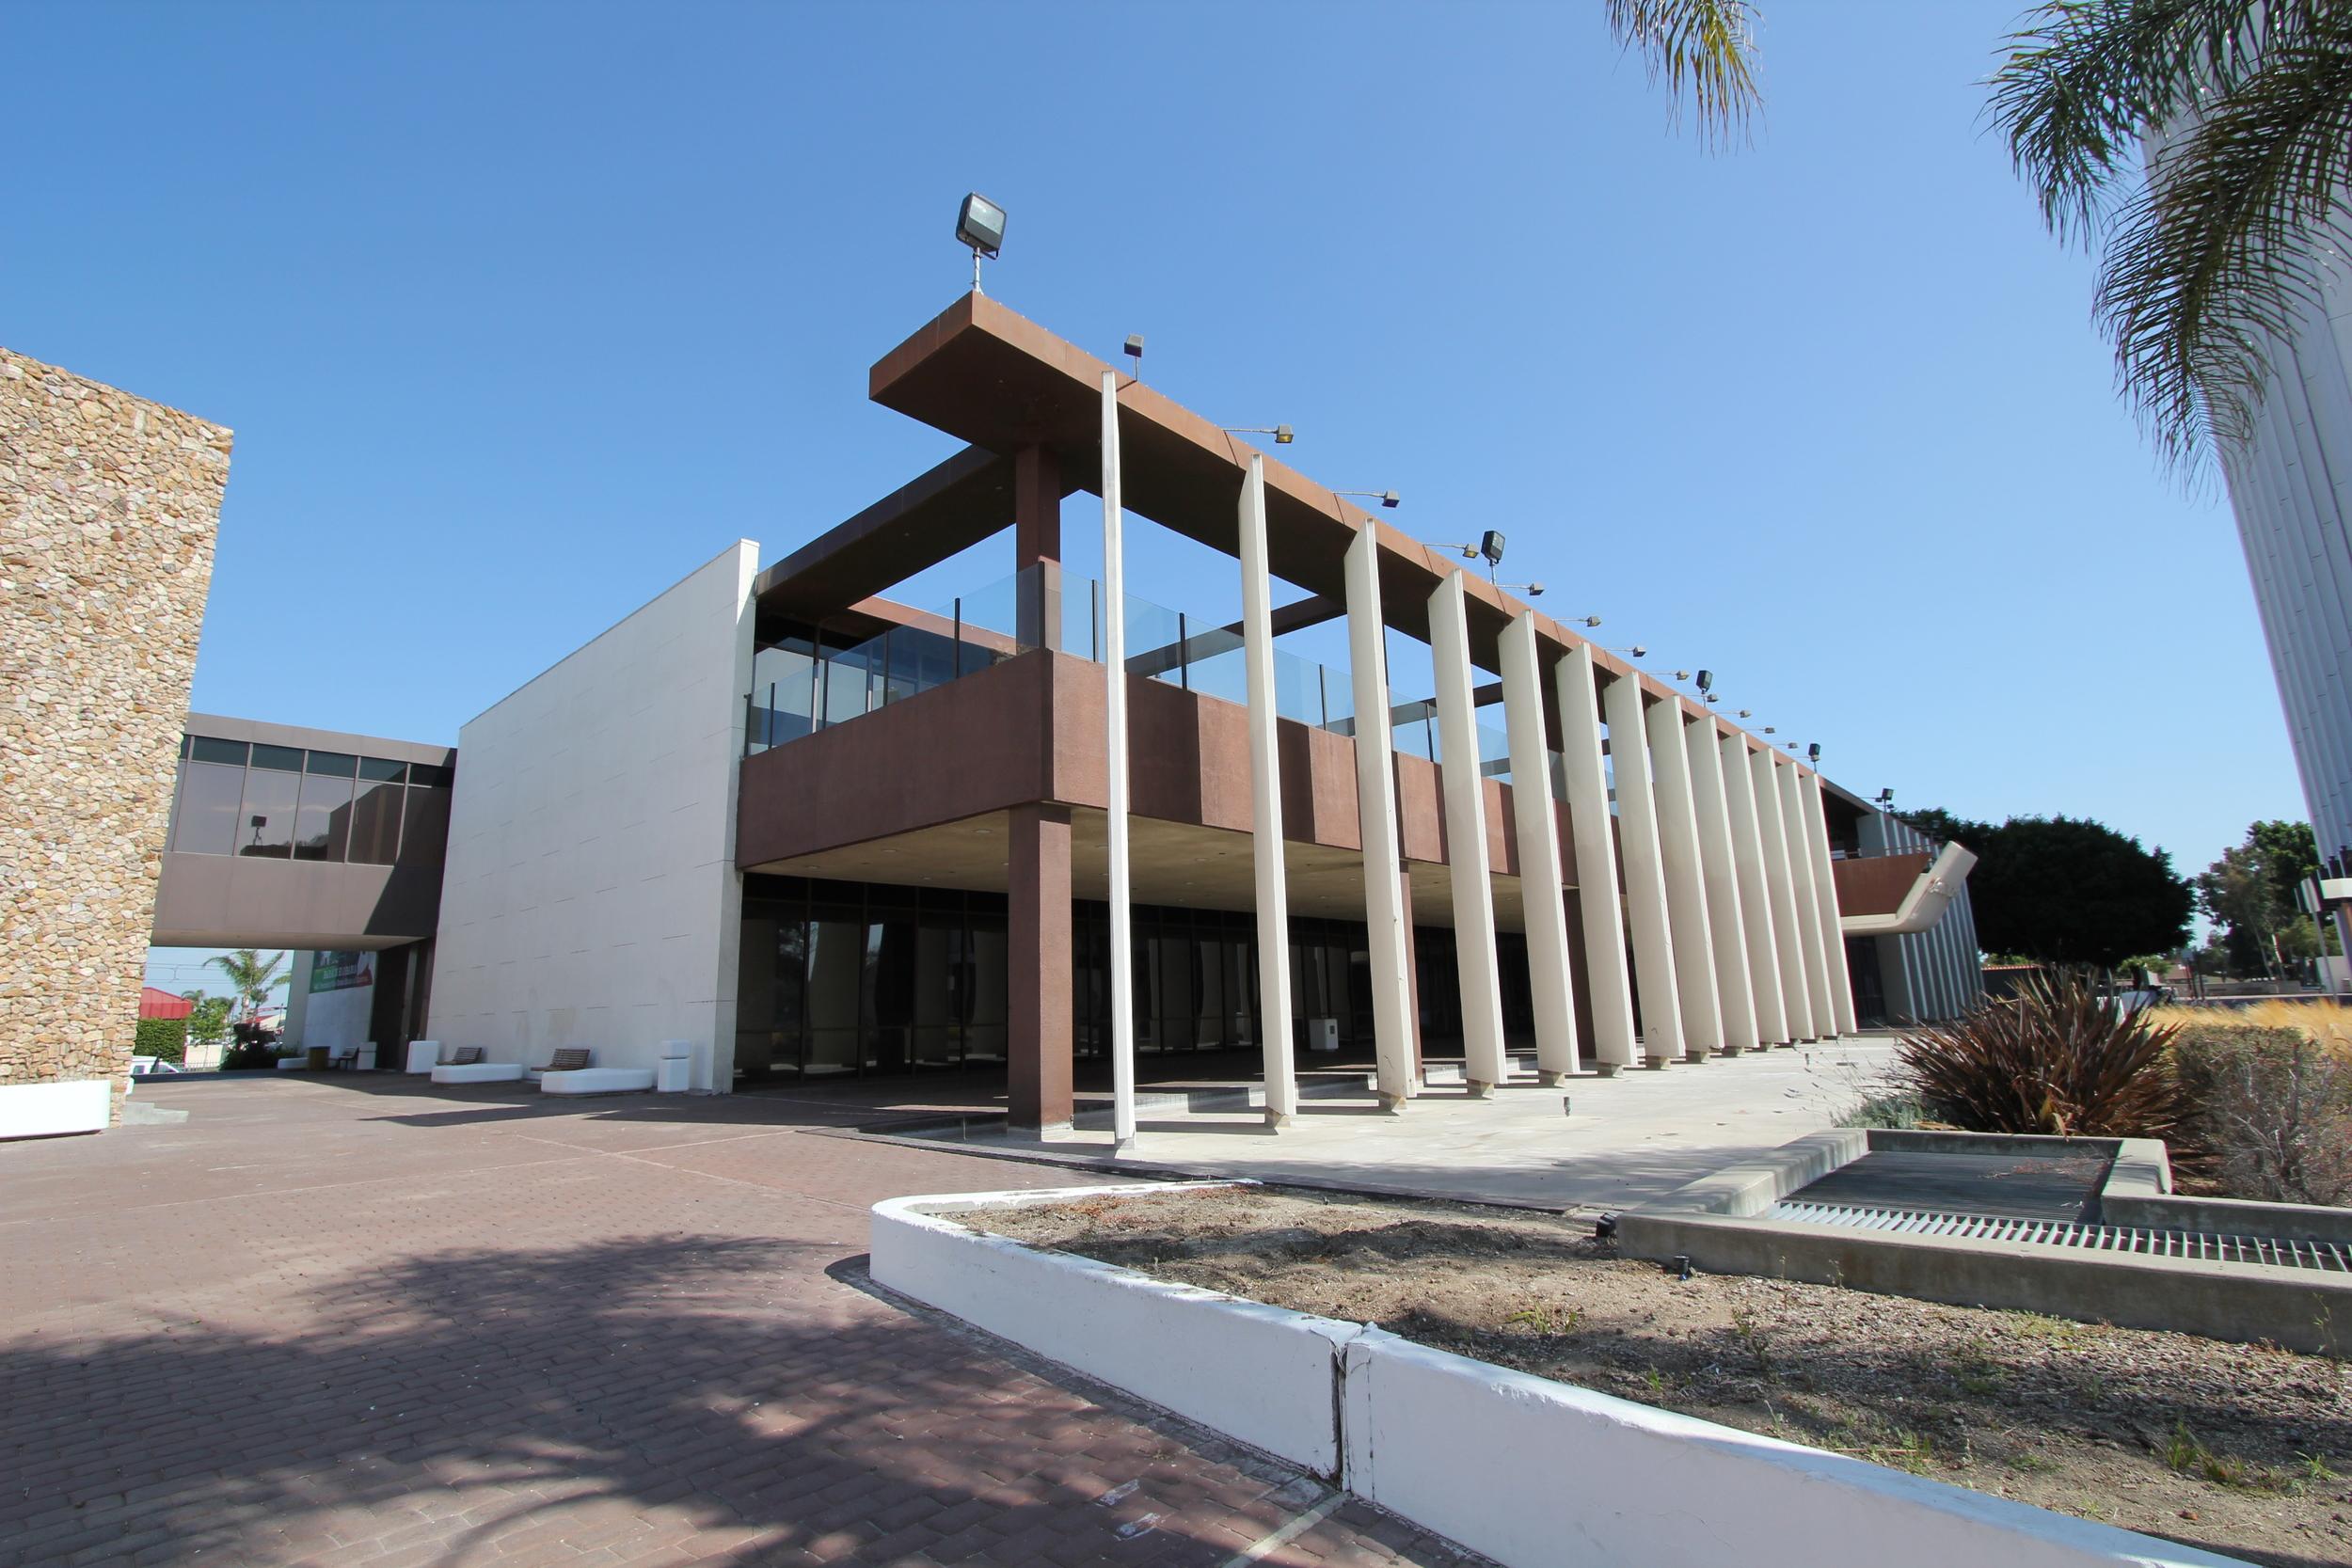 Compton City Hall (Chattel, 2012)